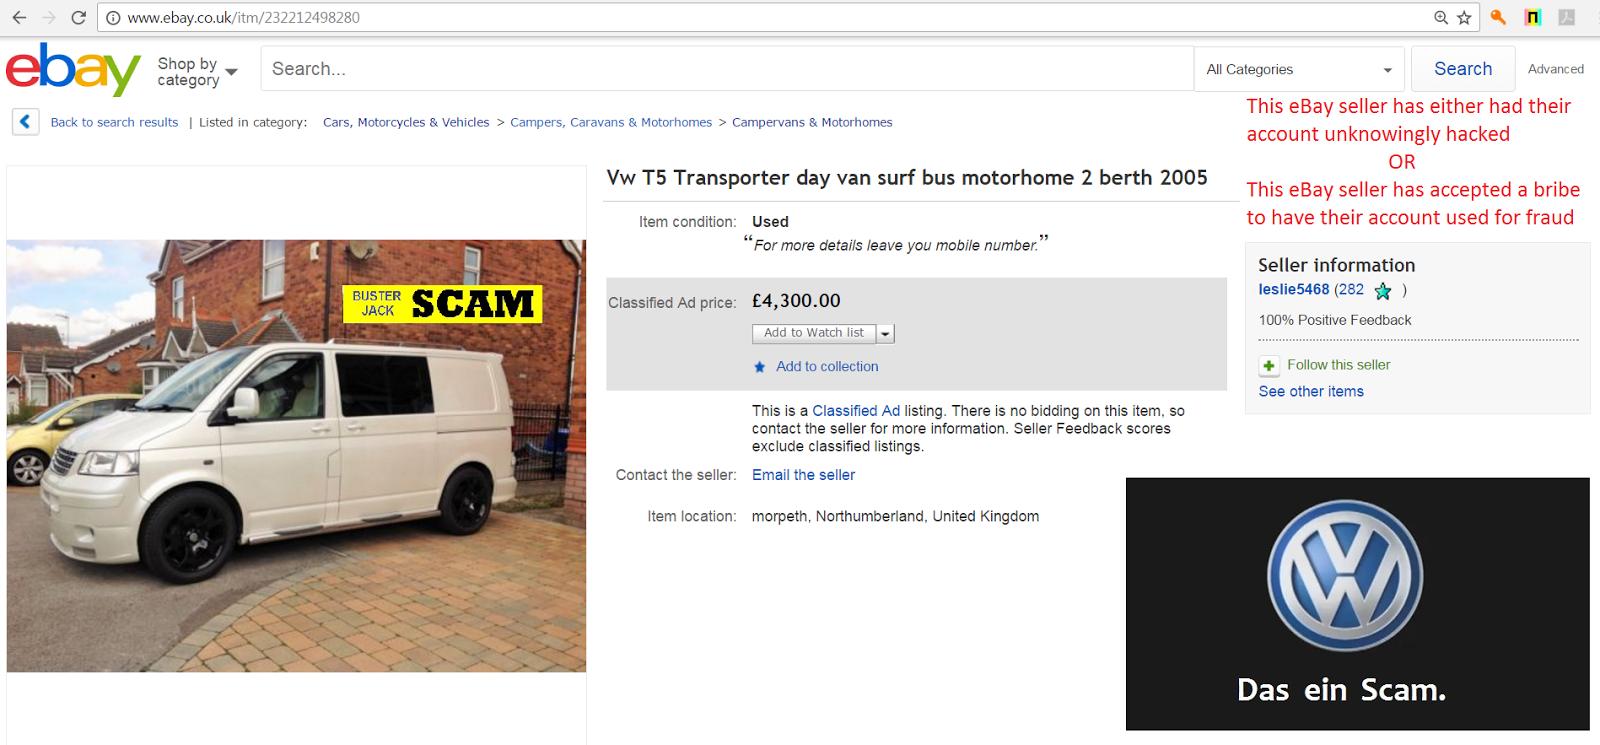 Ebay scam vw t5 transporter day surf van bd55xlm bd55 xlm fraud 20 jan 17